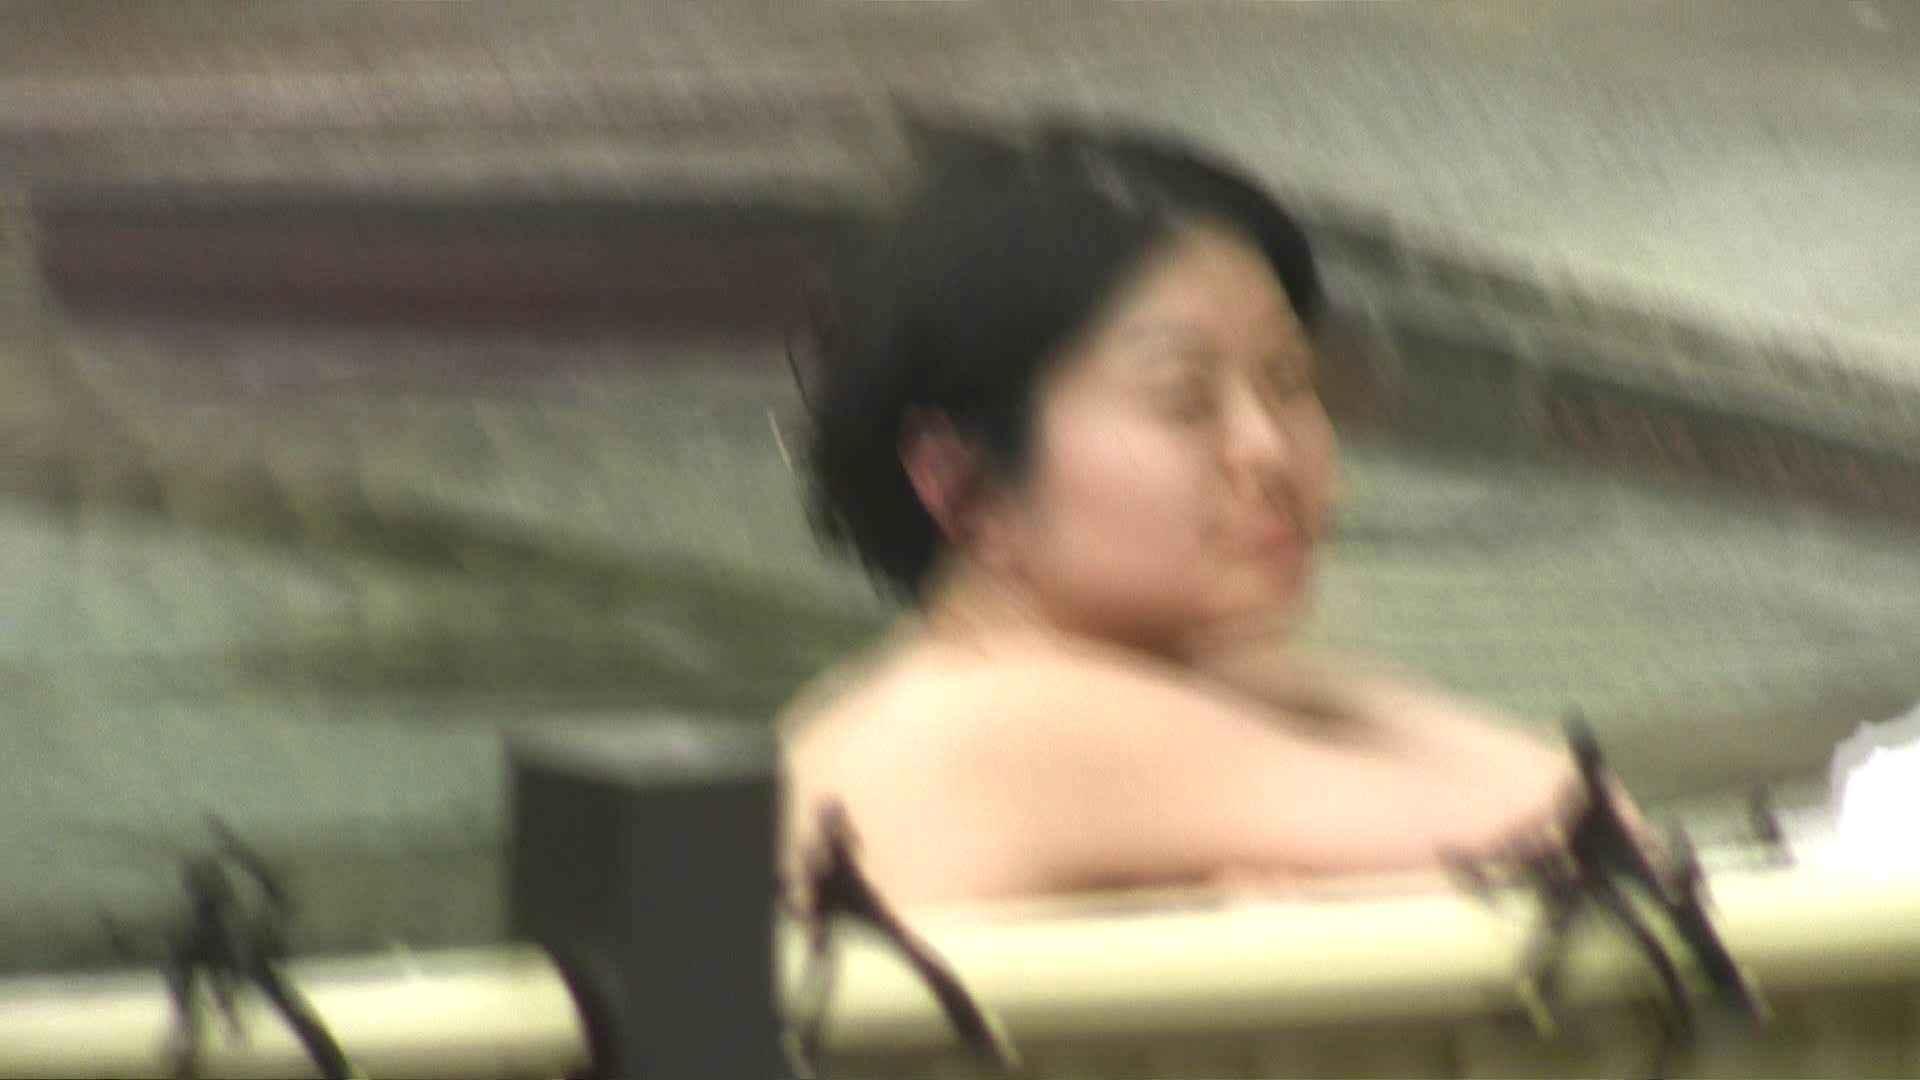 Aquaな露天風呂Vol.675 盗撮 | OLセックス  77画像 22